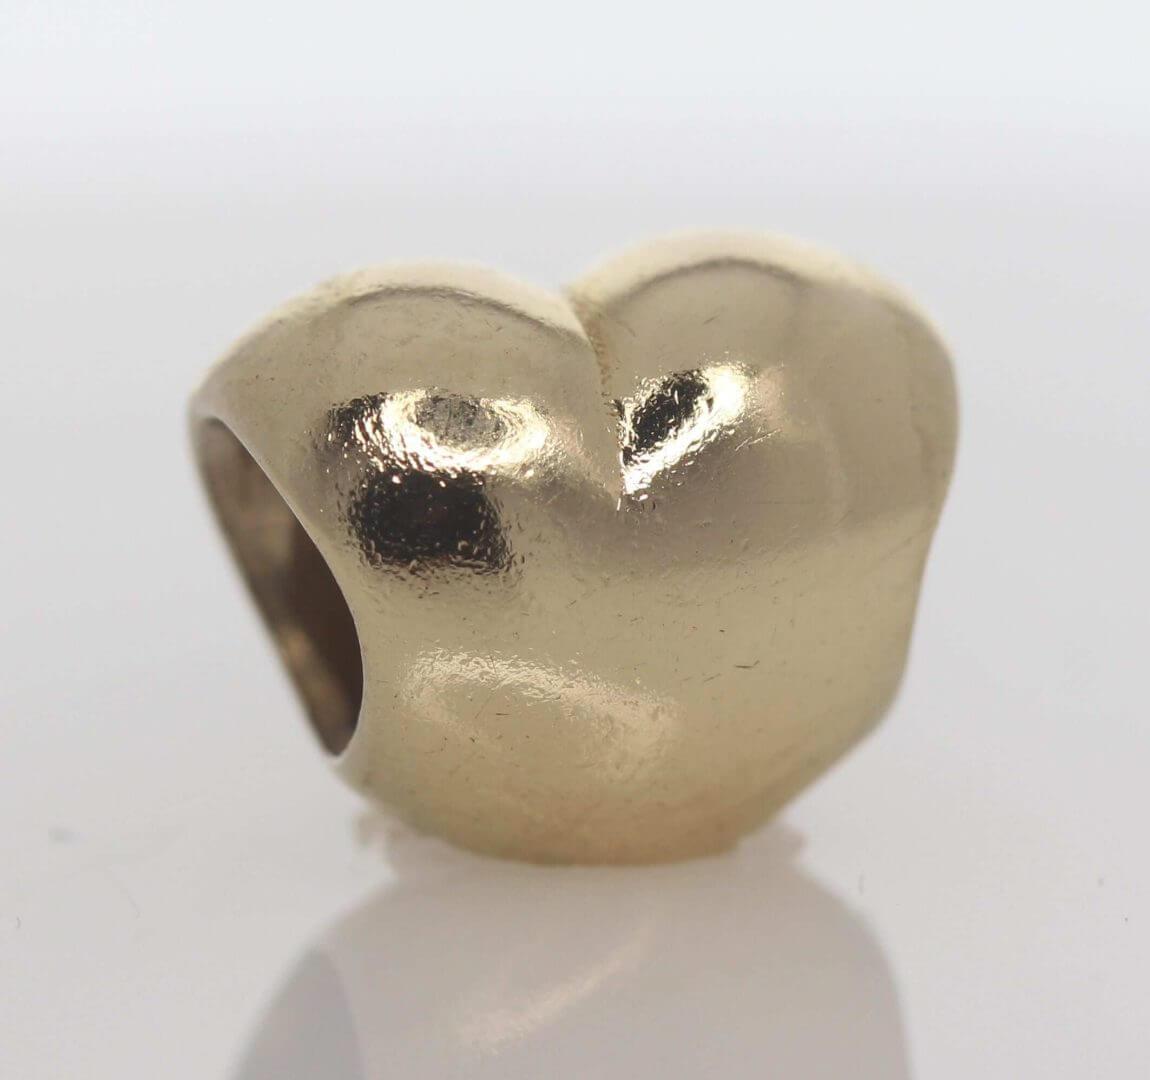 Pandora 14ct Gold Heart Charm - 750119 - ALE 585 1